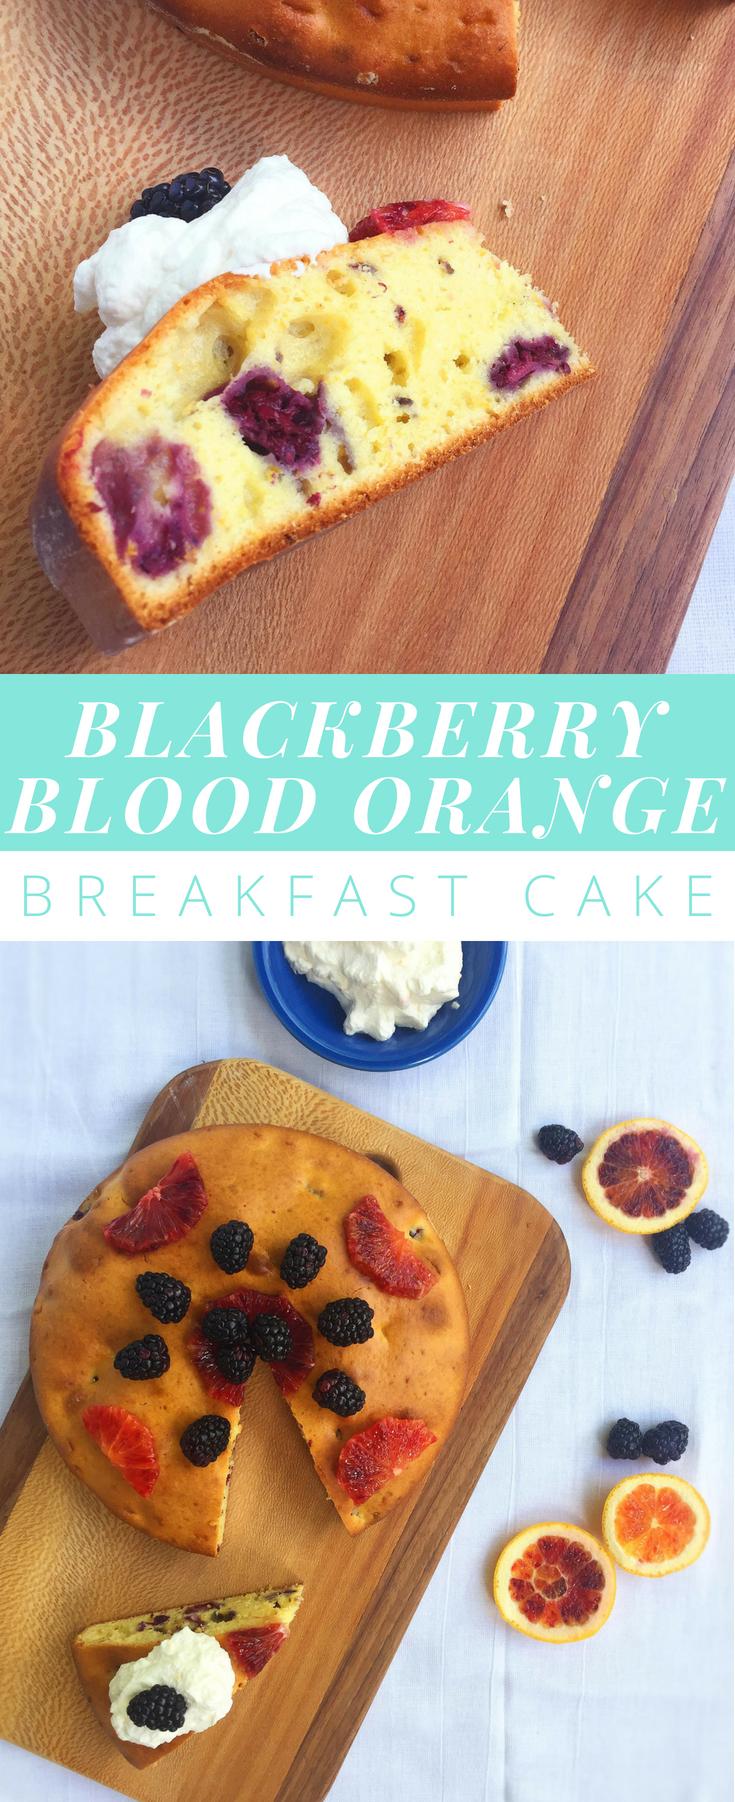 blackberry-blood-orange-breakfast-cake-pin.png